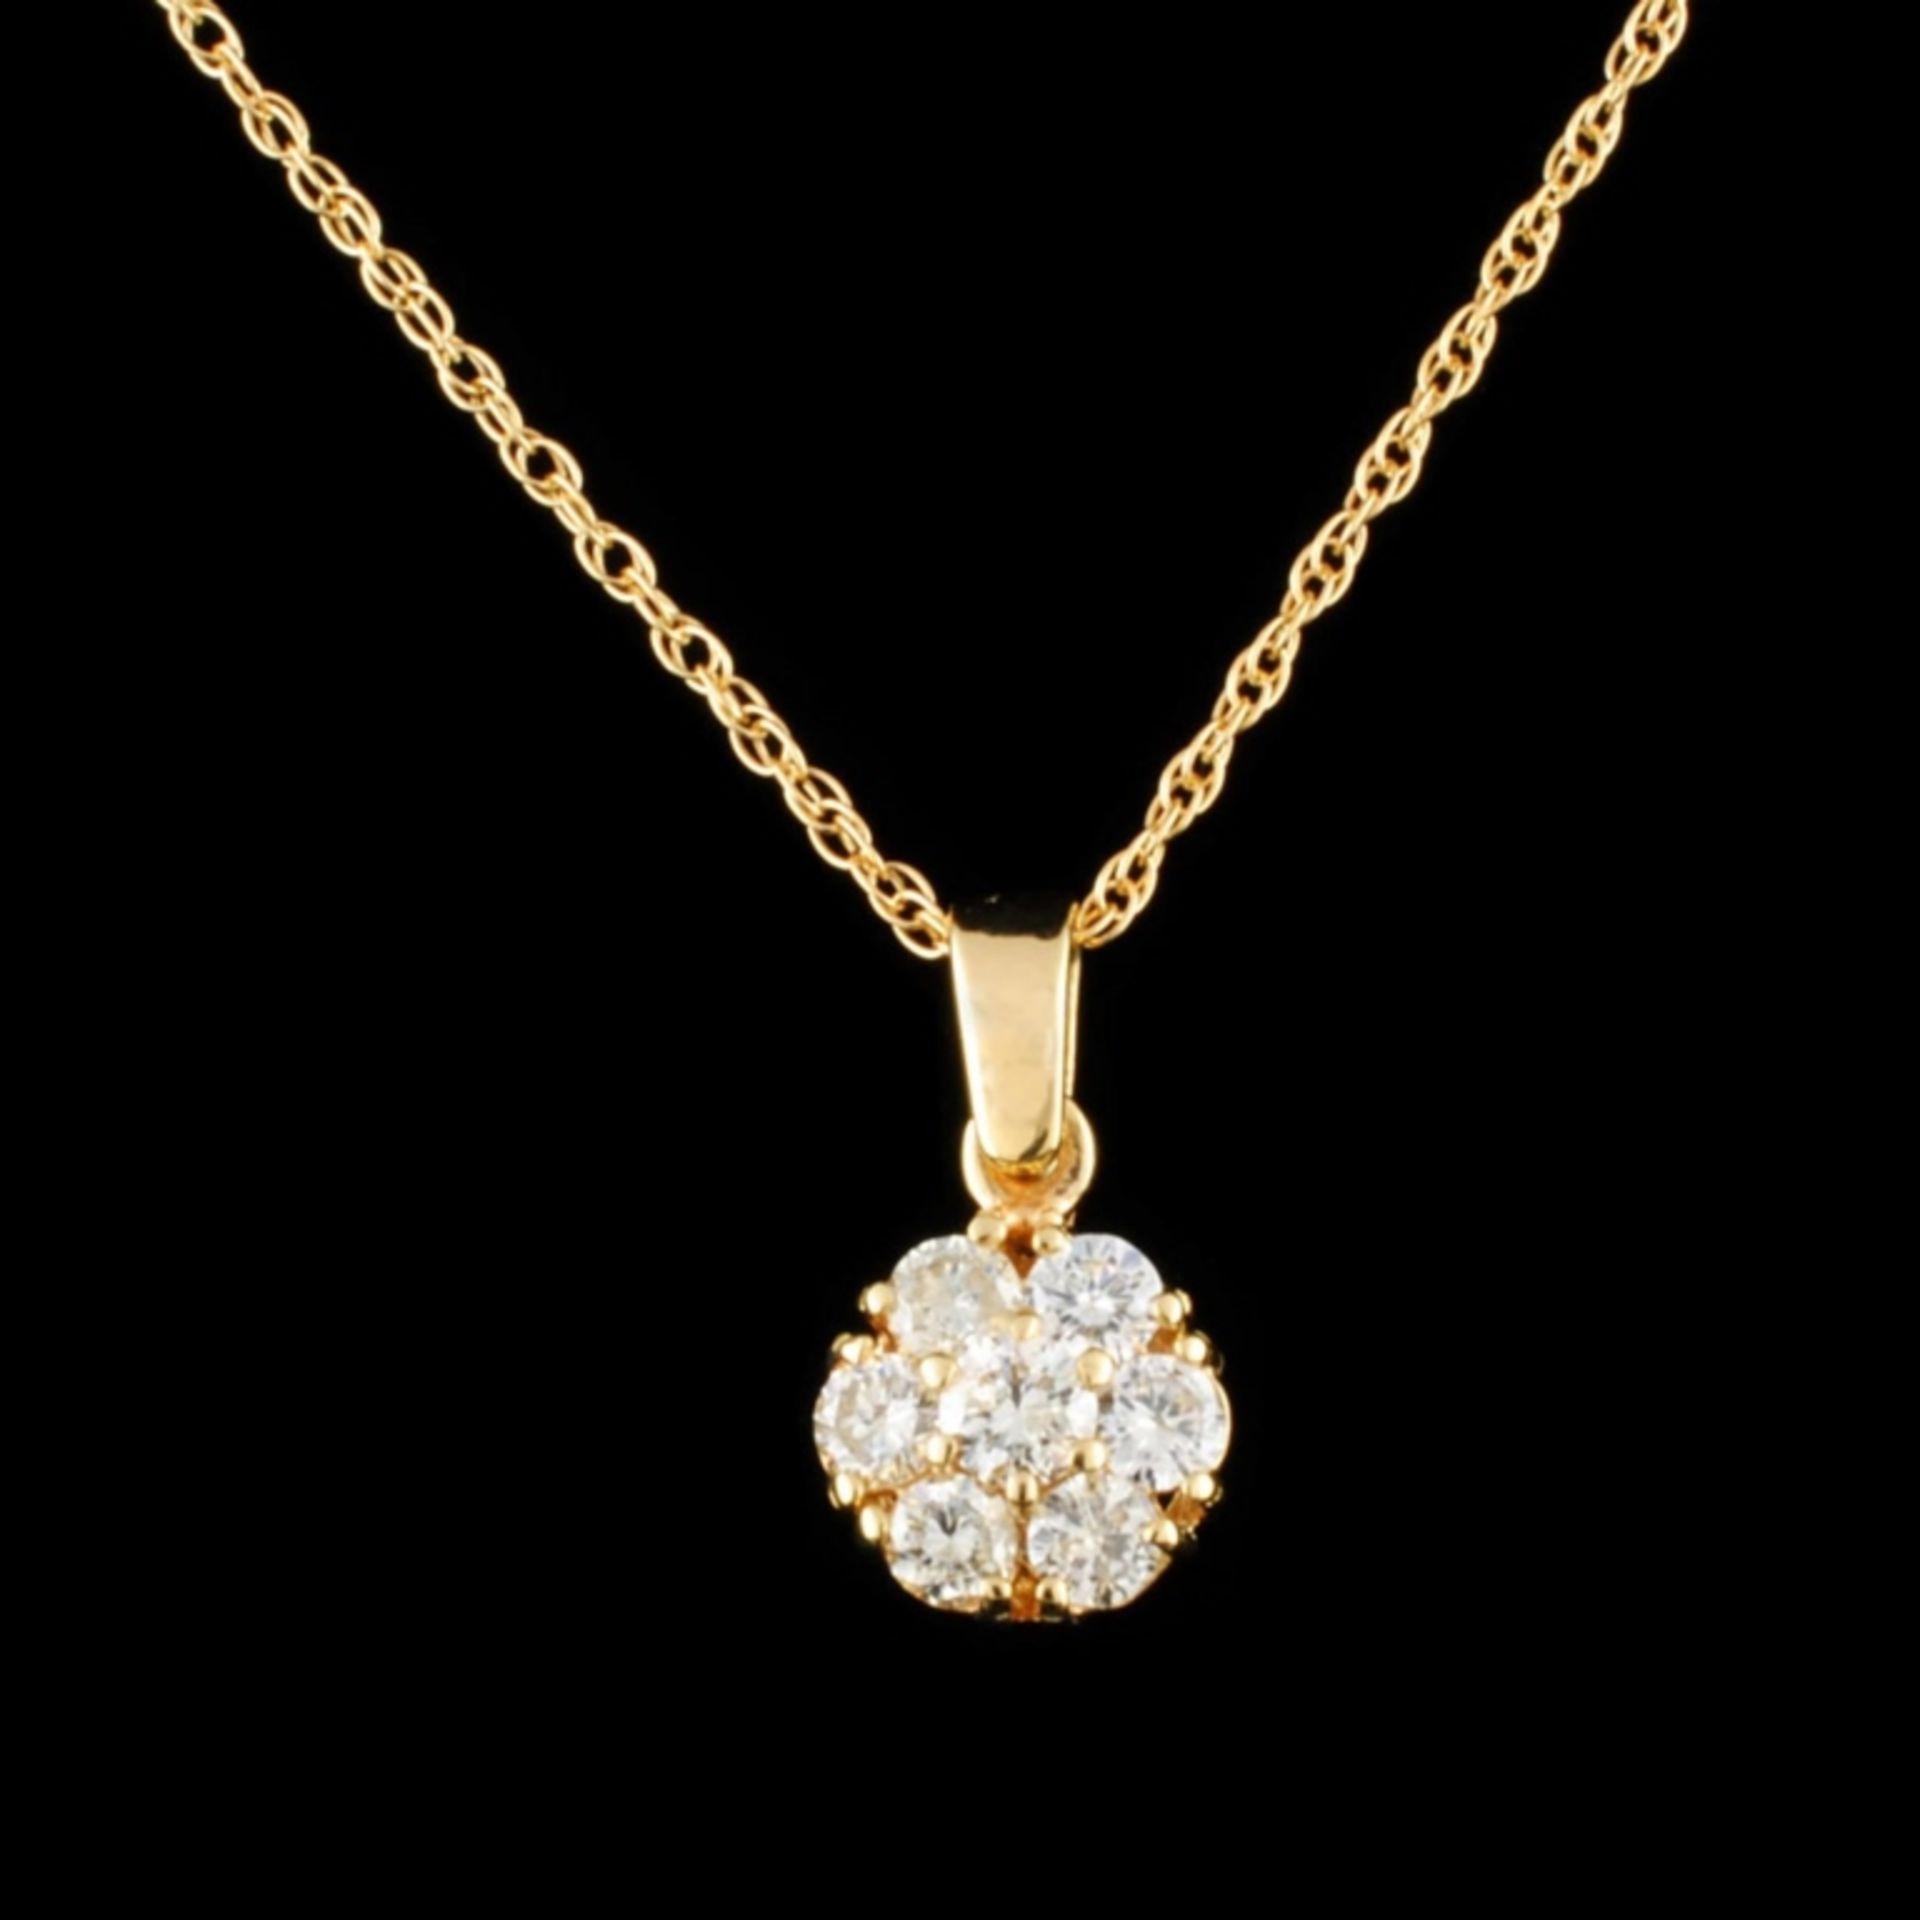 14K Gold 0.44ctw Diamond Pendant